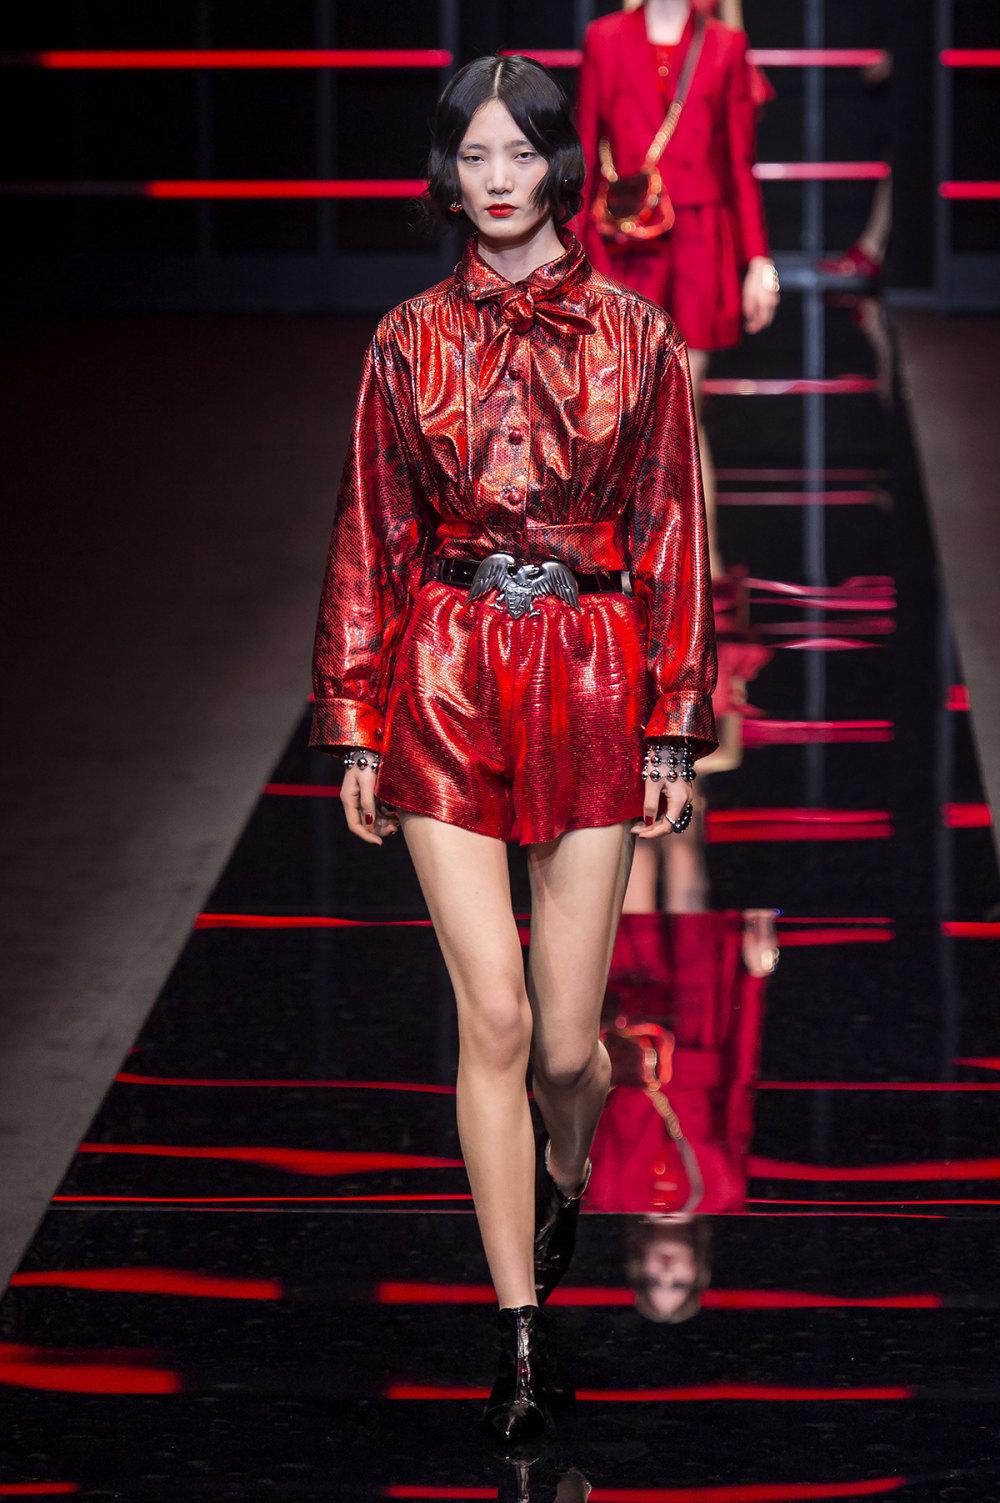 Emporio Armani时装系列畅的裤子带有柔滑裙子的鸡尾酒礼服-56.jpg